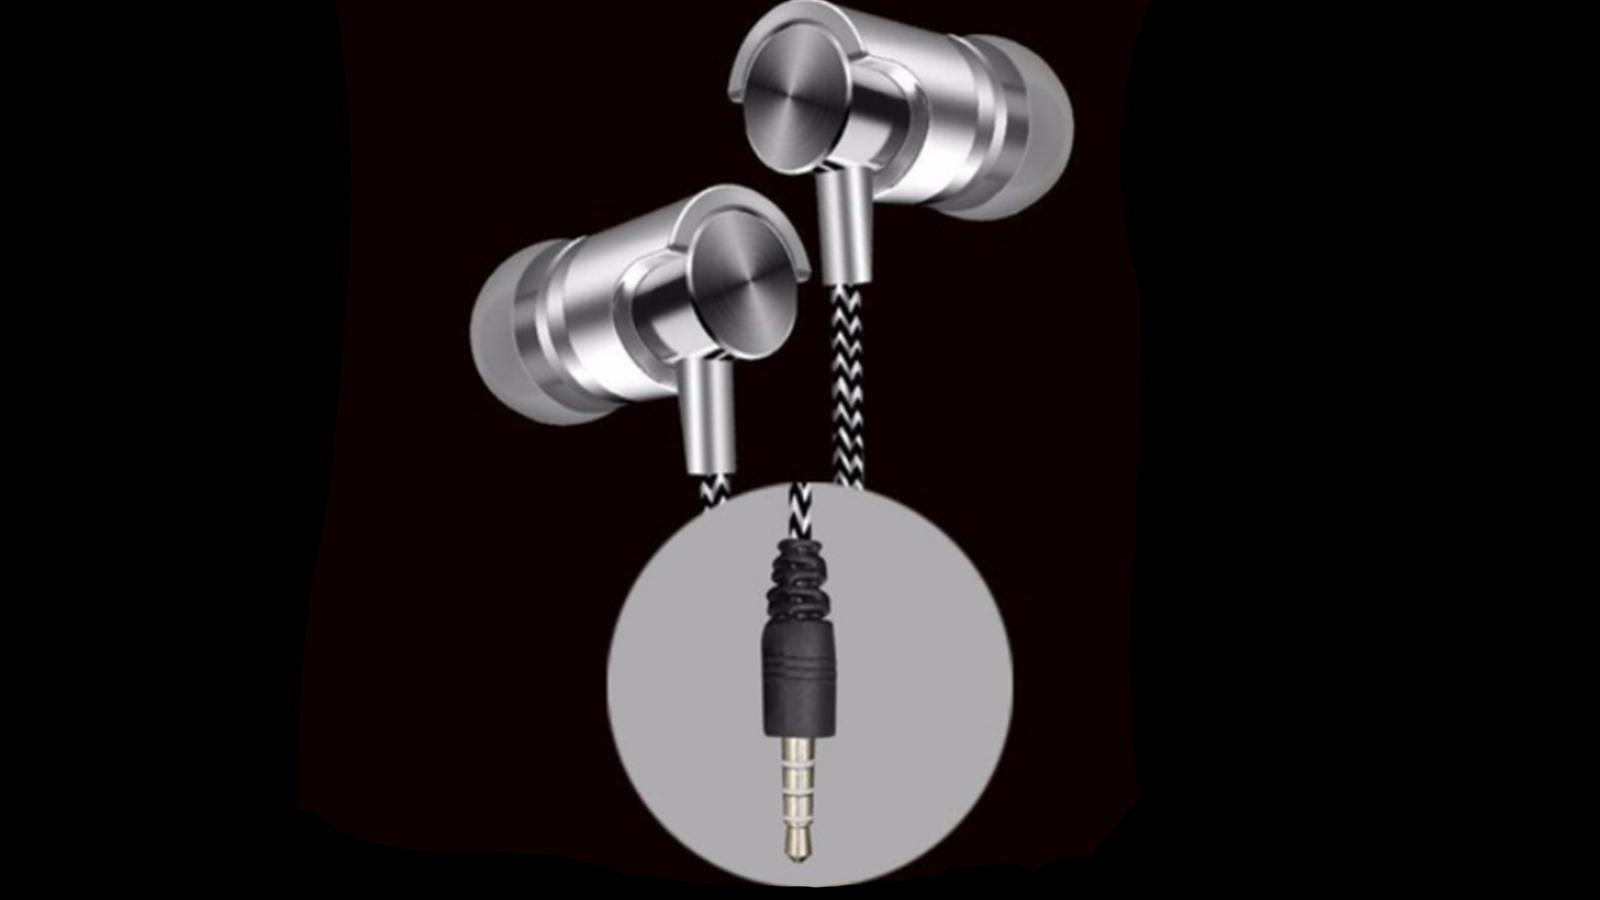 Sport Music Stereo Professional In-Ear Earphones For Phones